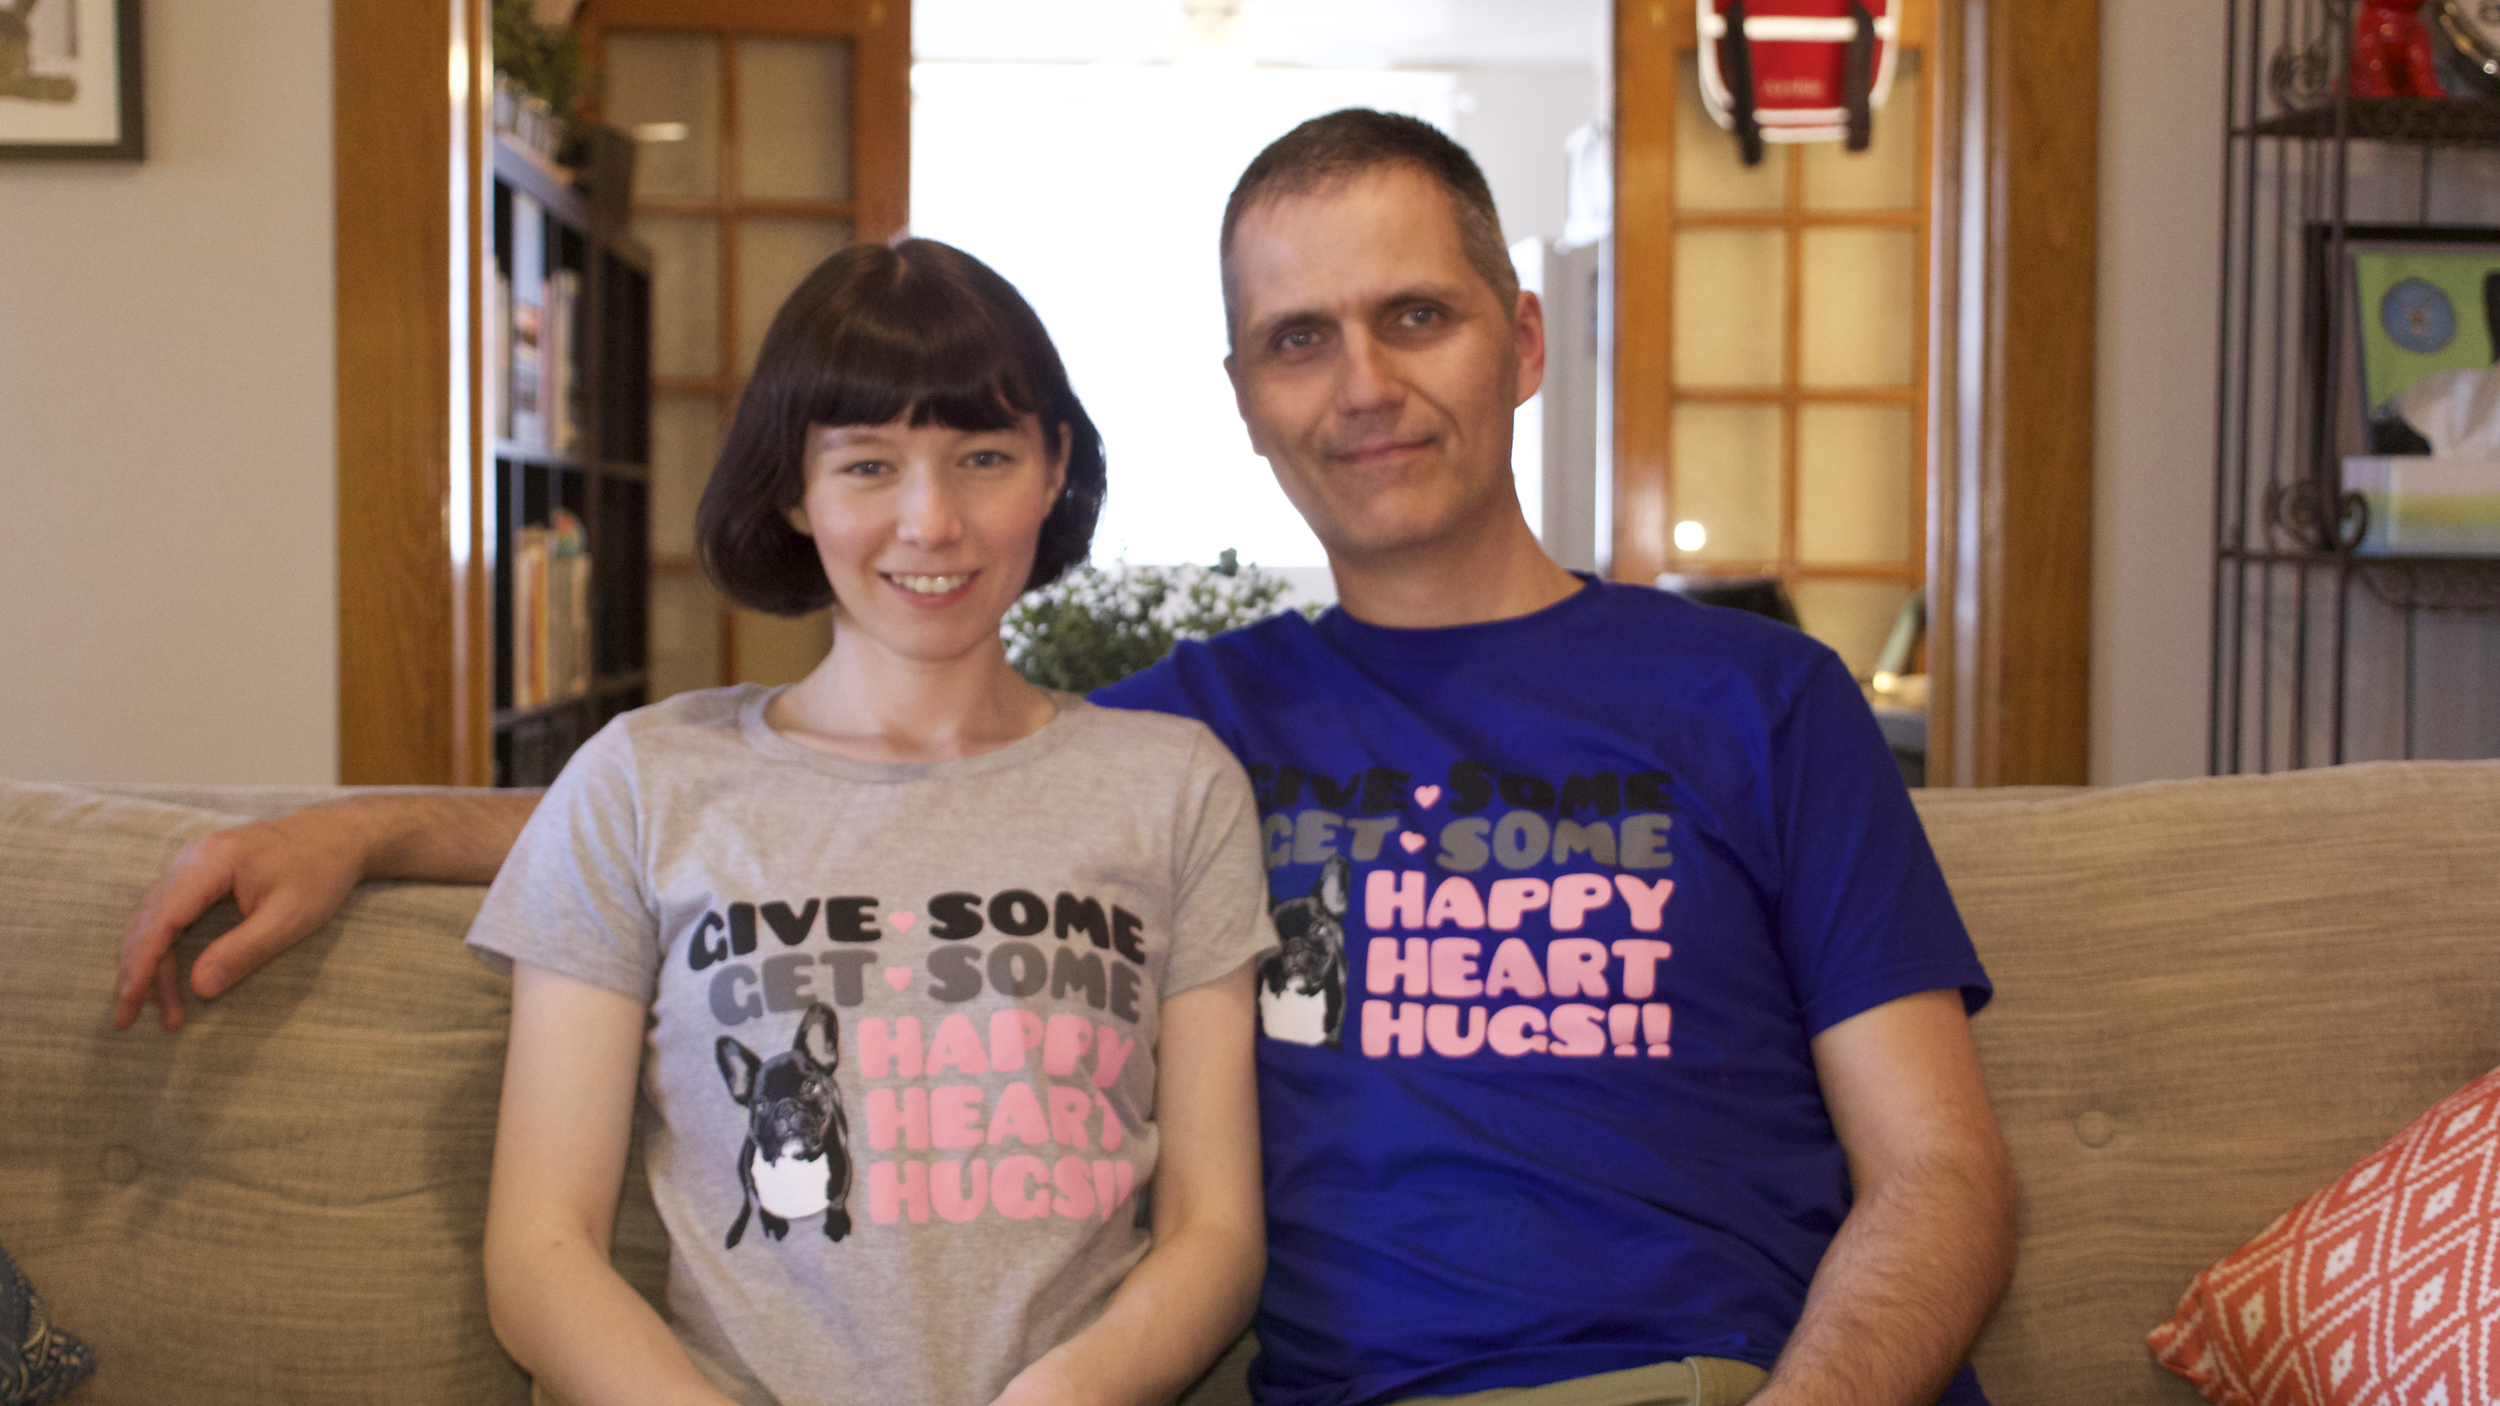 Mum plus Pop in their HappyHeartHugs Charity shirt!!